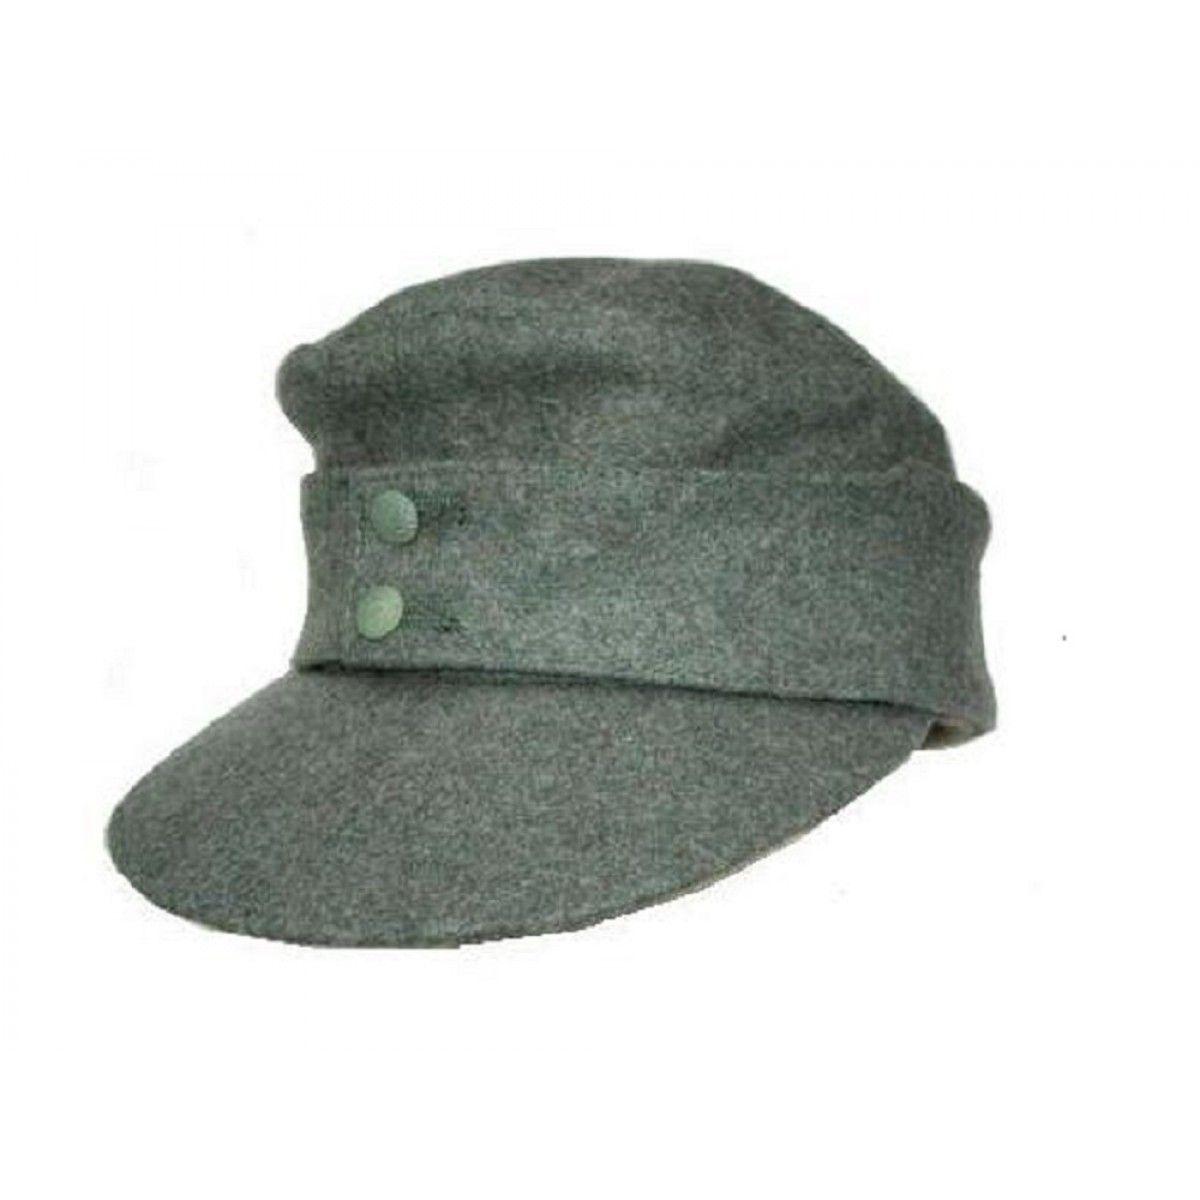 c0b8d5e7 M43 Ski Cap - Gebirgsjäger Style Bergmütze | German army 1936-1945 ...